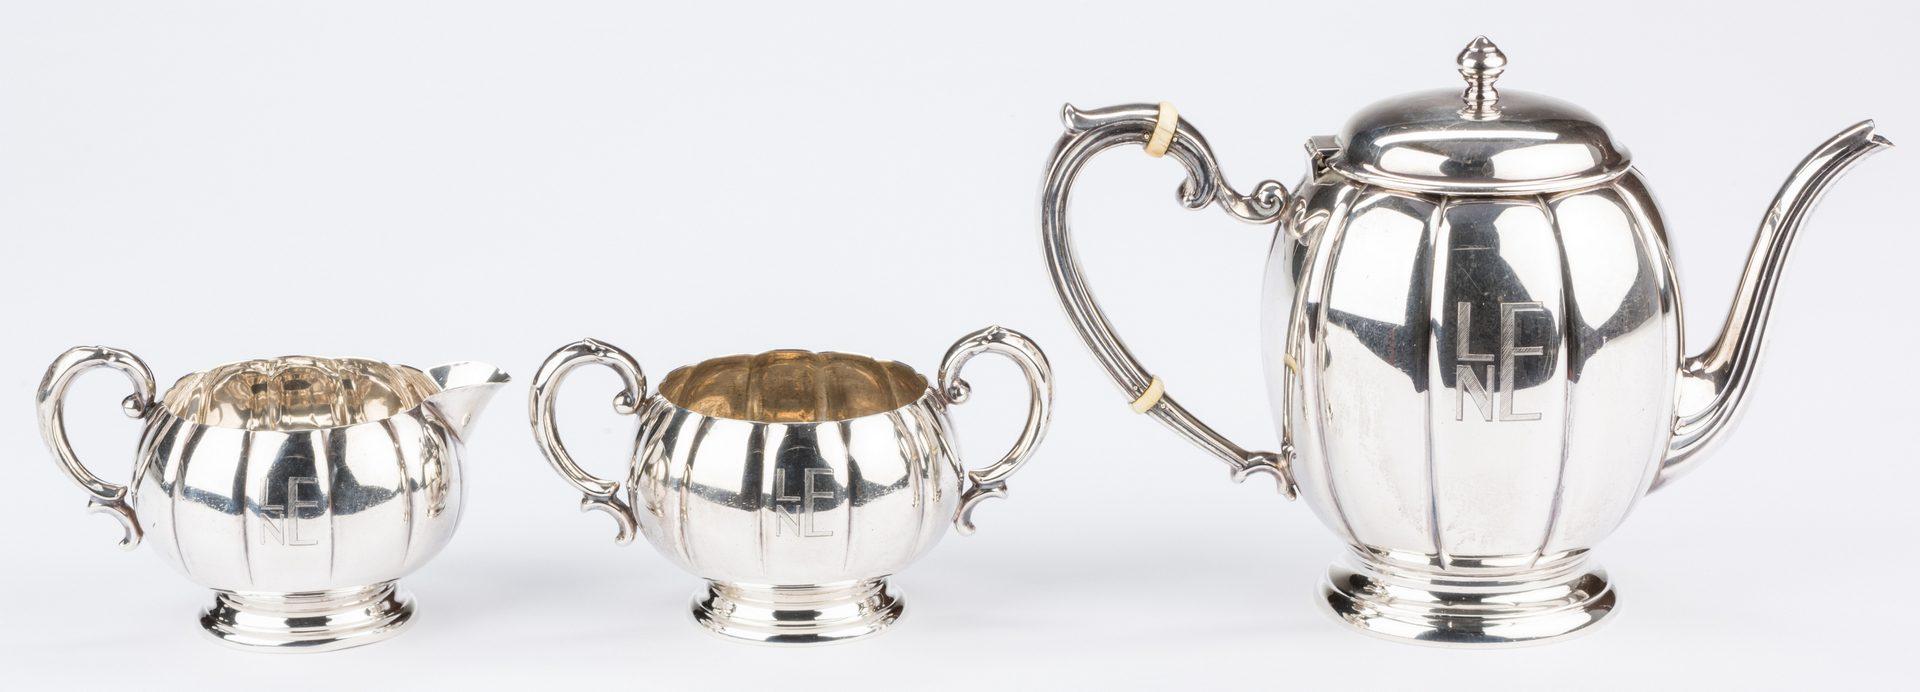 Lot 687: Watson Co. Sterling Tea Set, 3 pcs